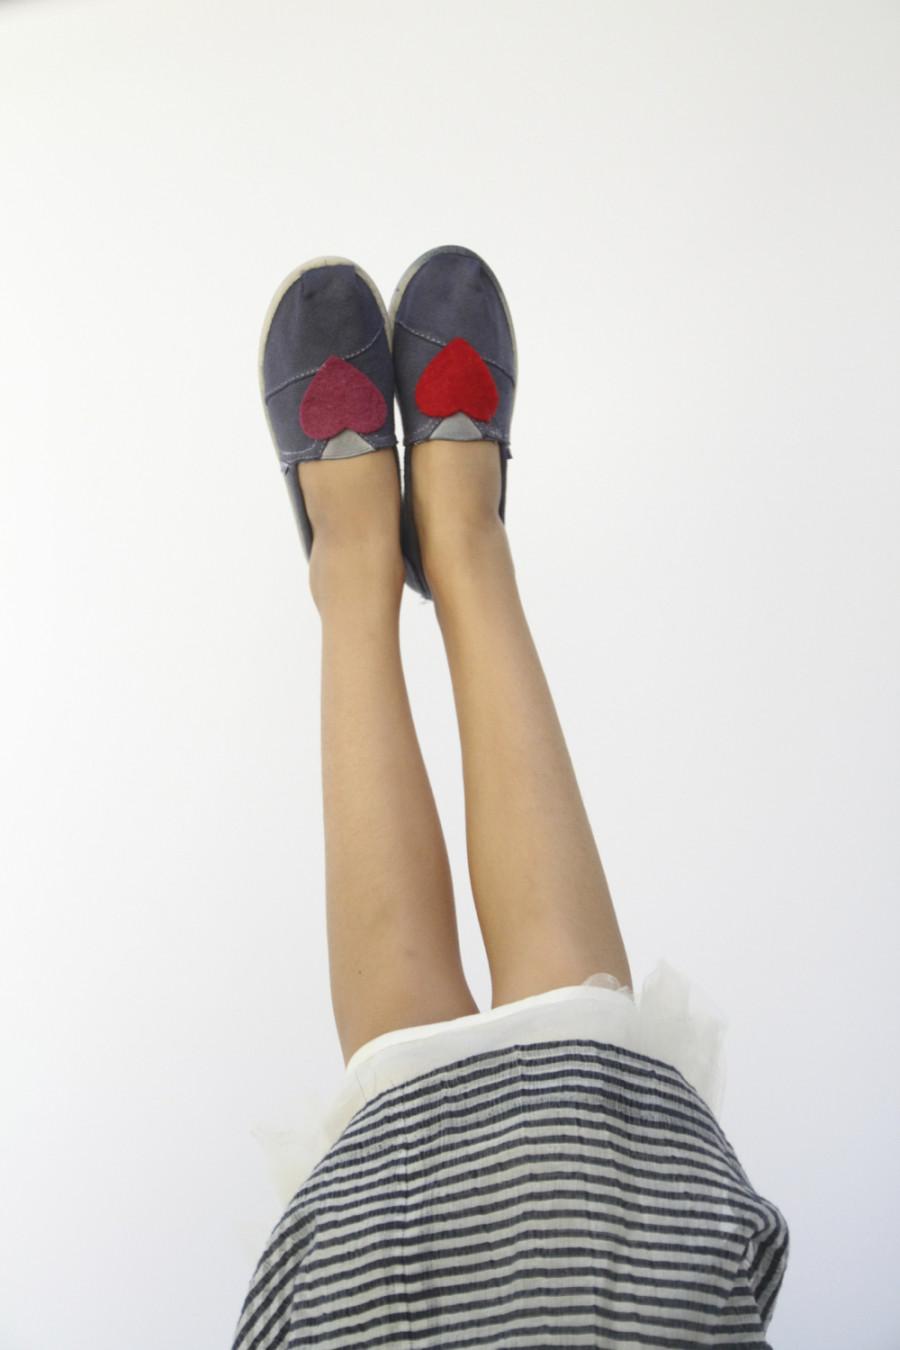 Yep, they look good upside down, too!